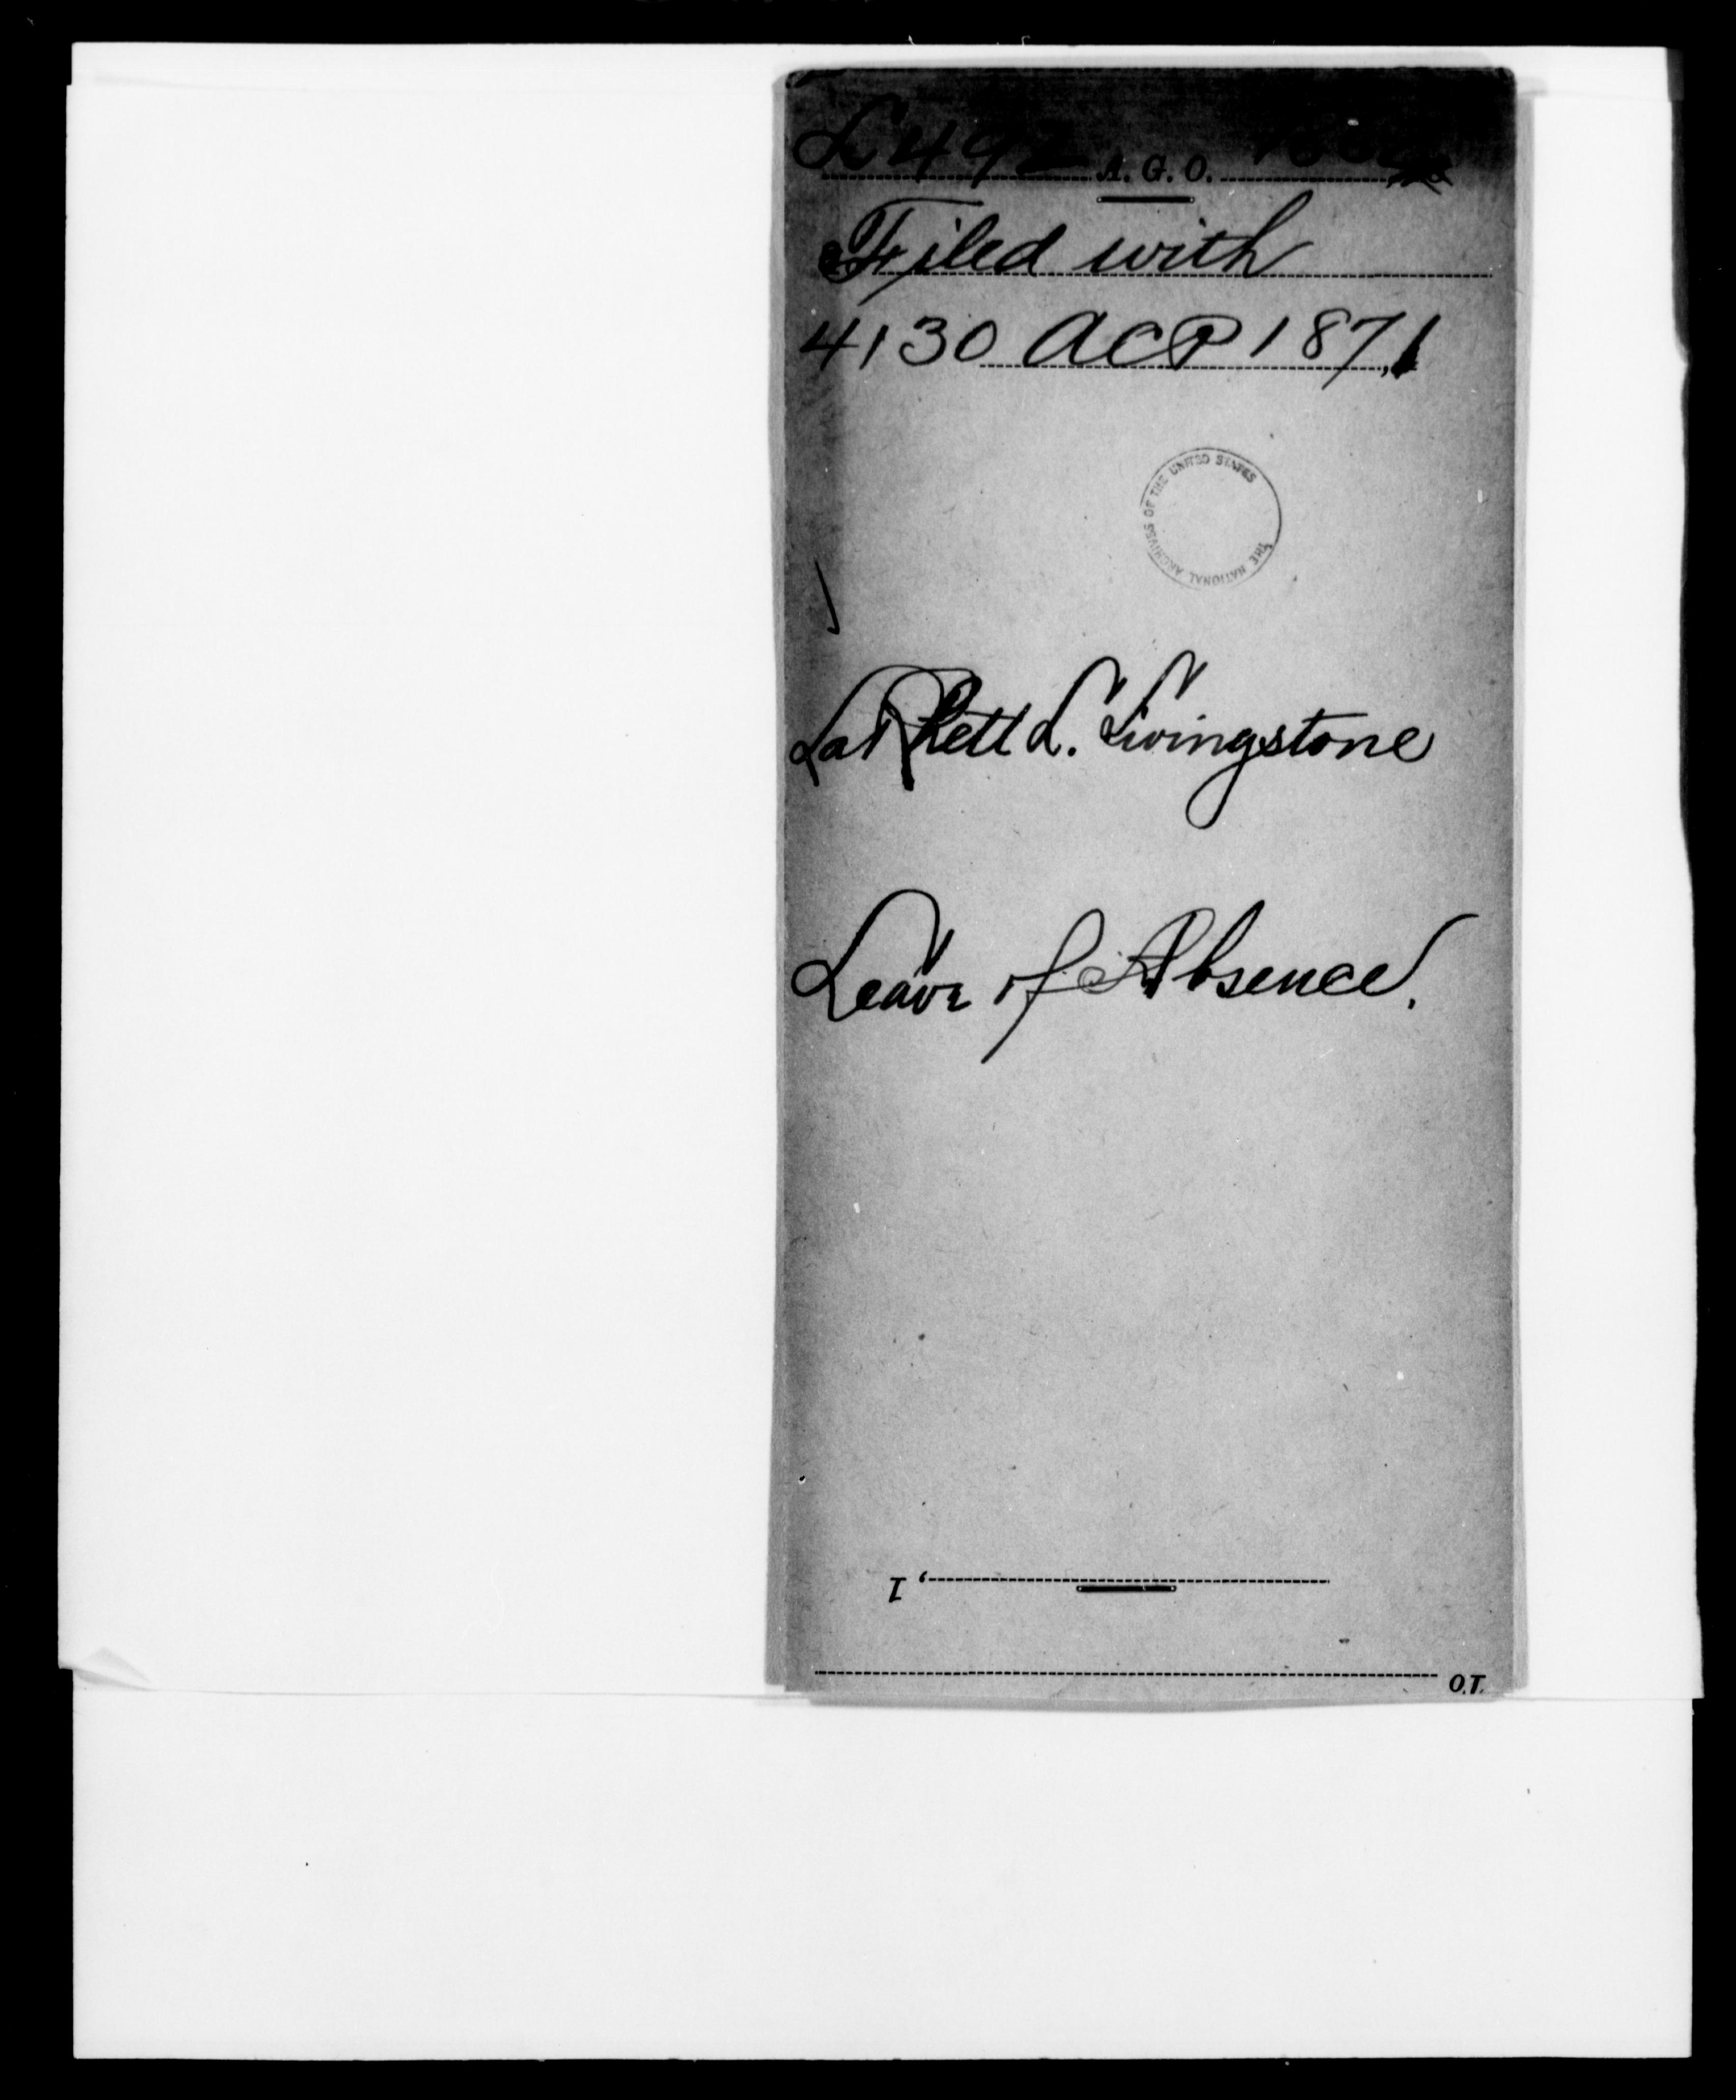 1862 - Livingstone, Rett L - File No. L492